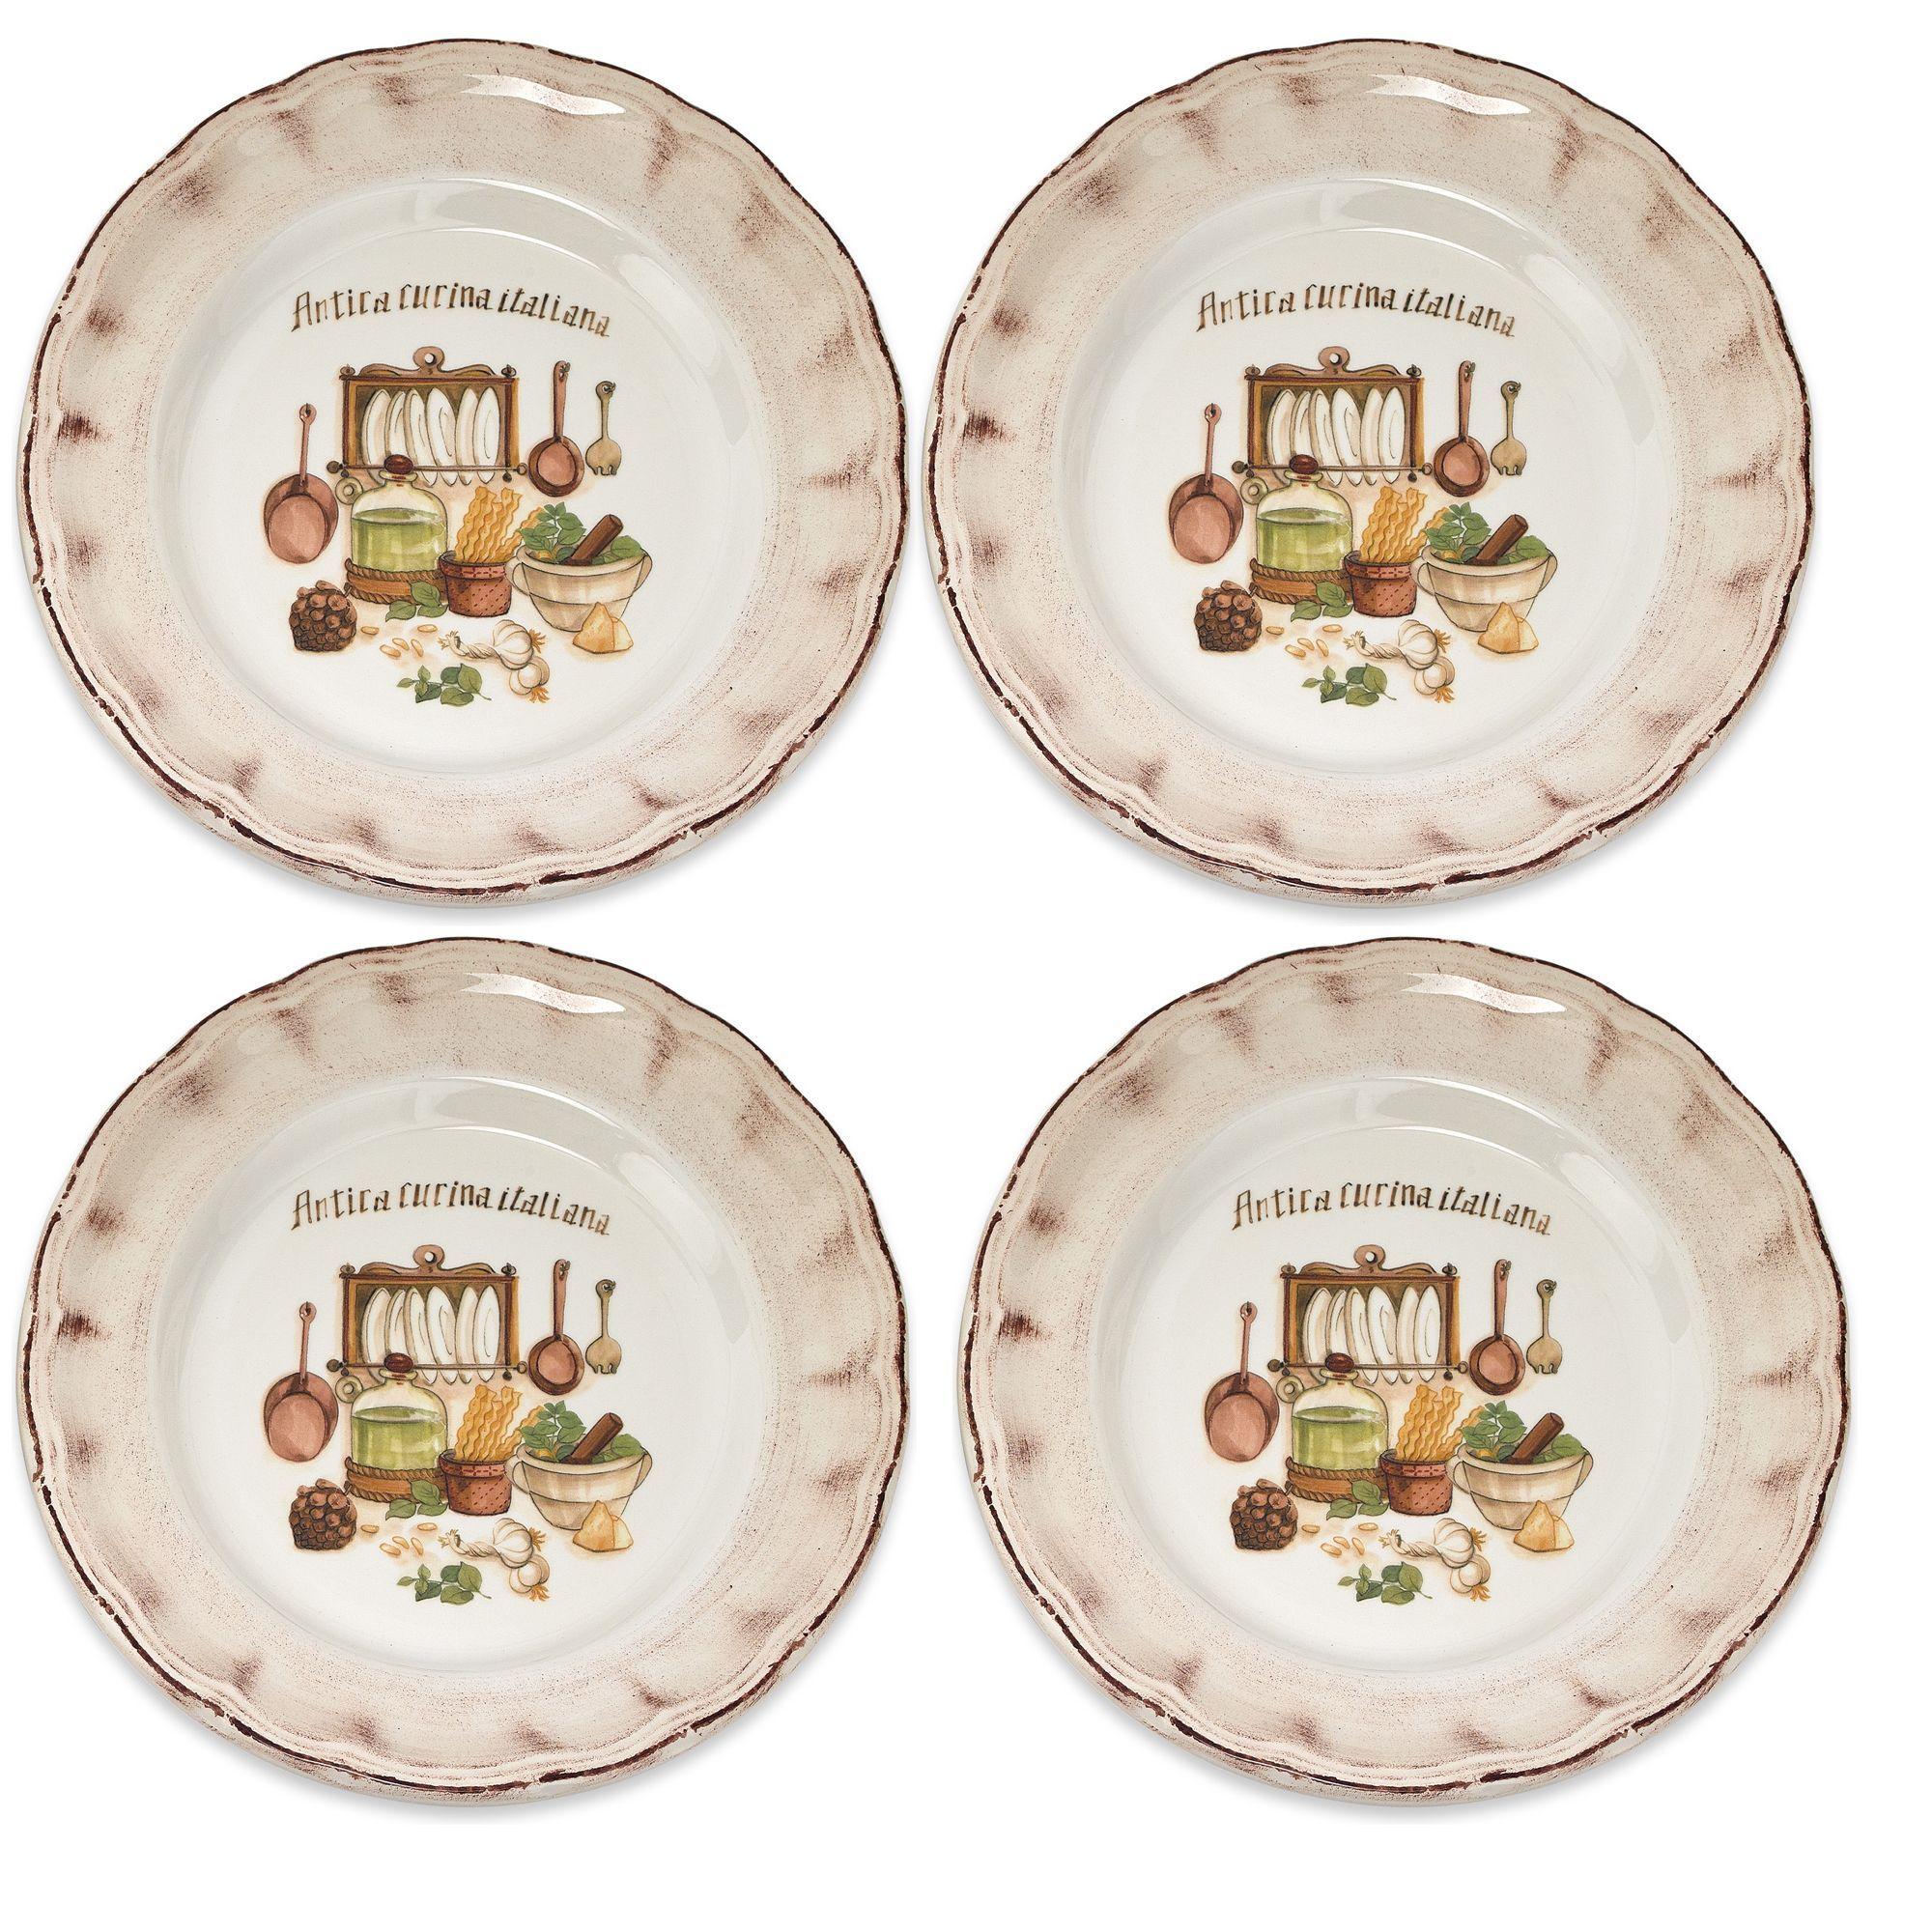 Lorren Home Trend Italian-made Cucina Italiana Dinner Plates (Set of 4) (4-piece Set) Beige (Ceramic Country)  sc 1 st  Pinterest & Lorren Home Trend Italian-made Cucina Italiana Dinner Plates (Set of ...